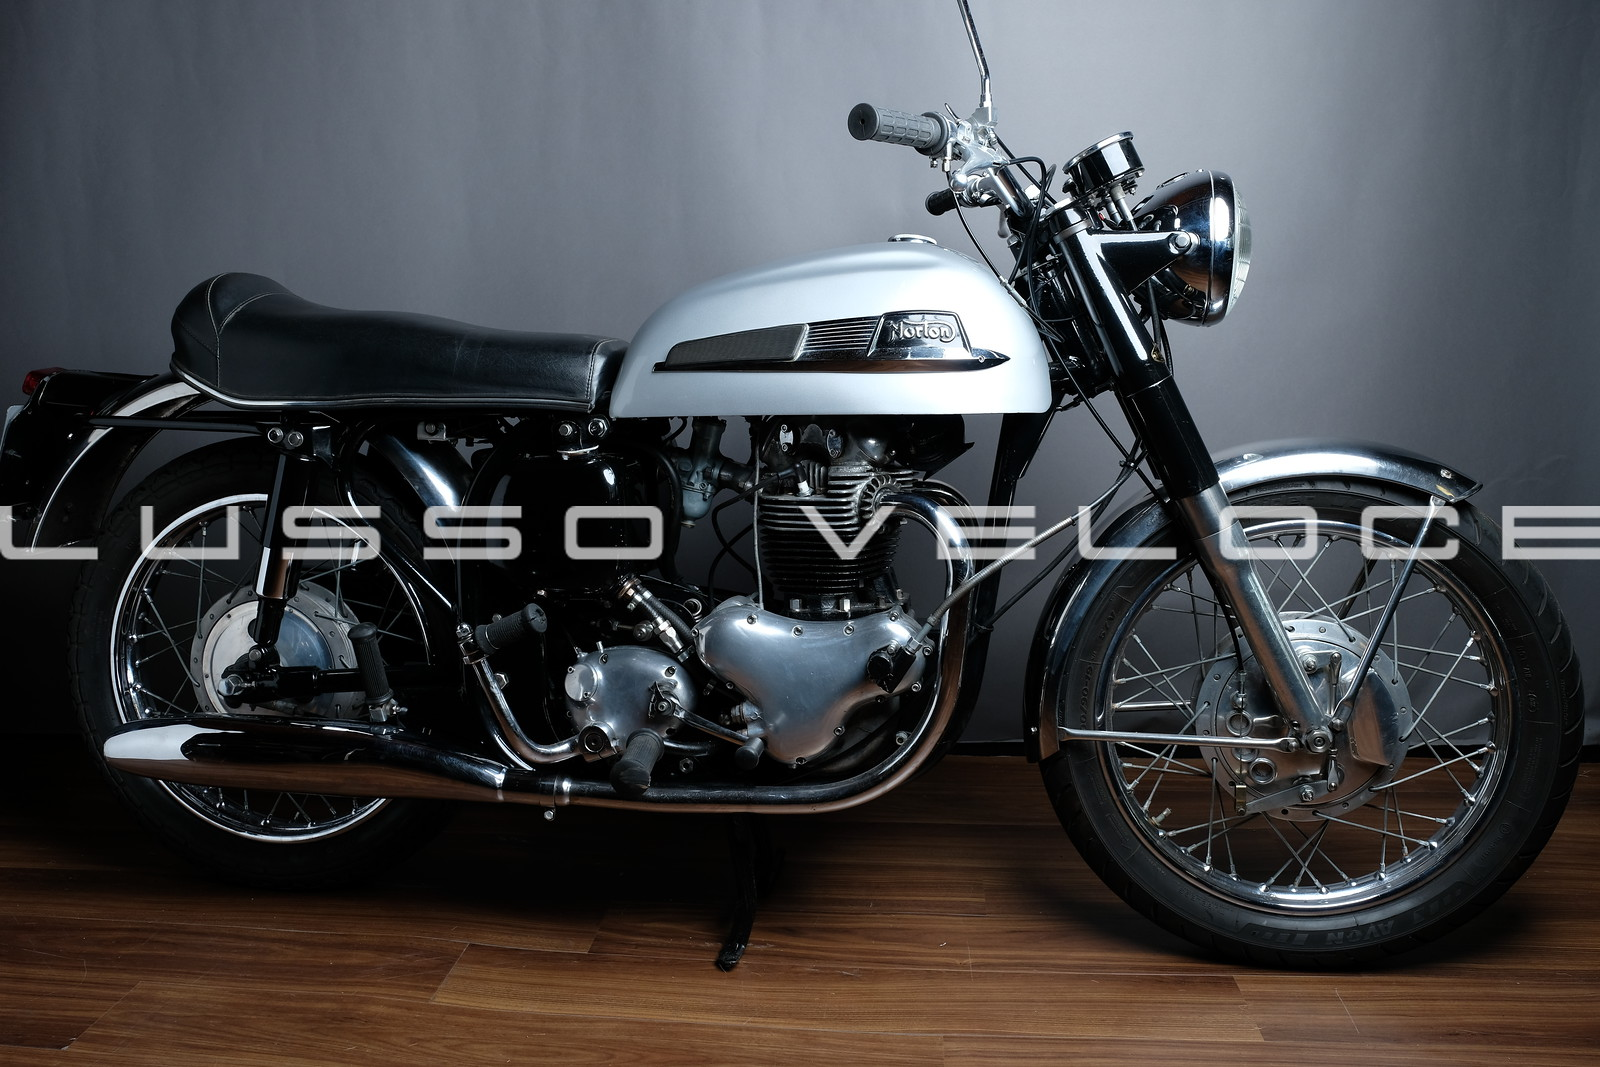 Norton Mercury 650